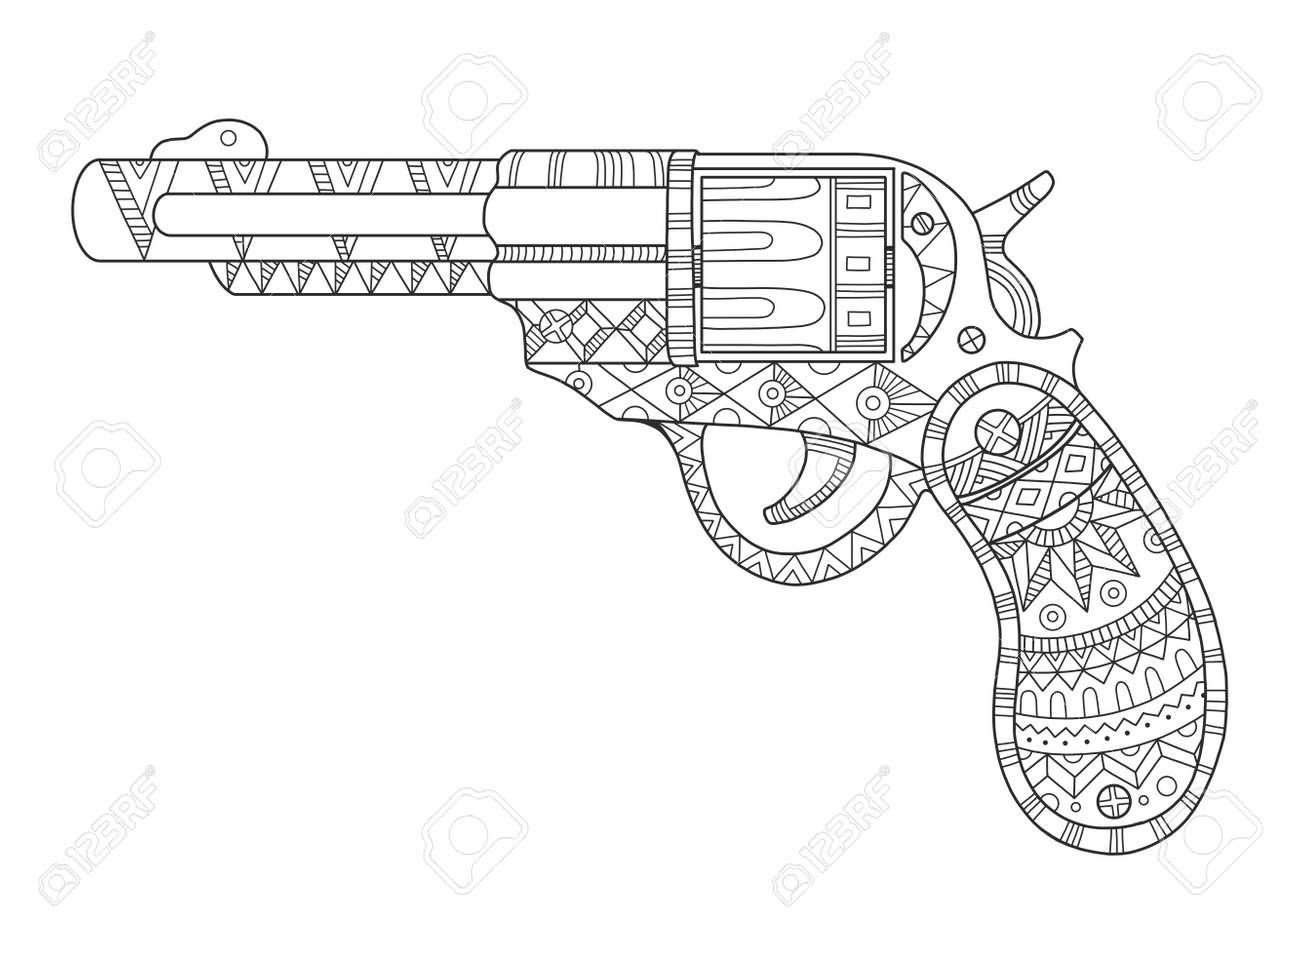 revólver pistola para colorear libro ilustración vectorial líneas